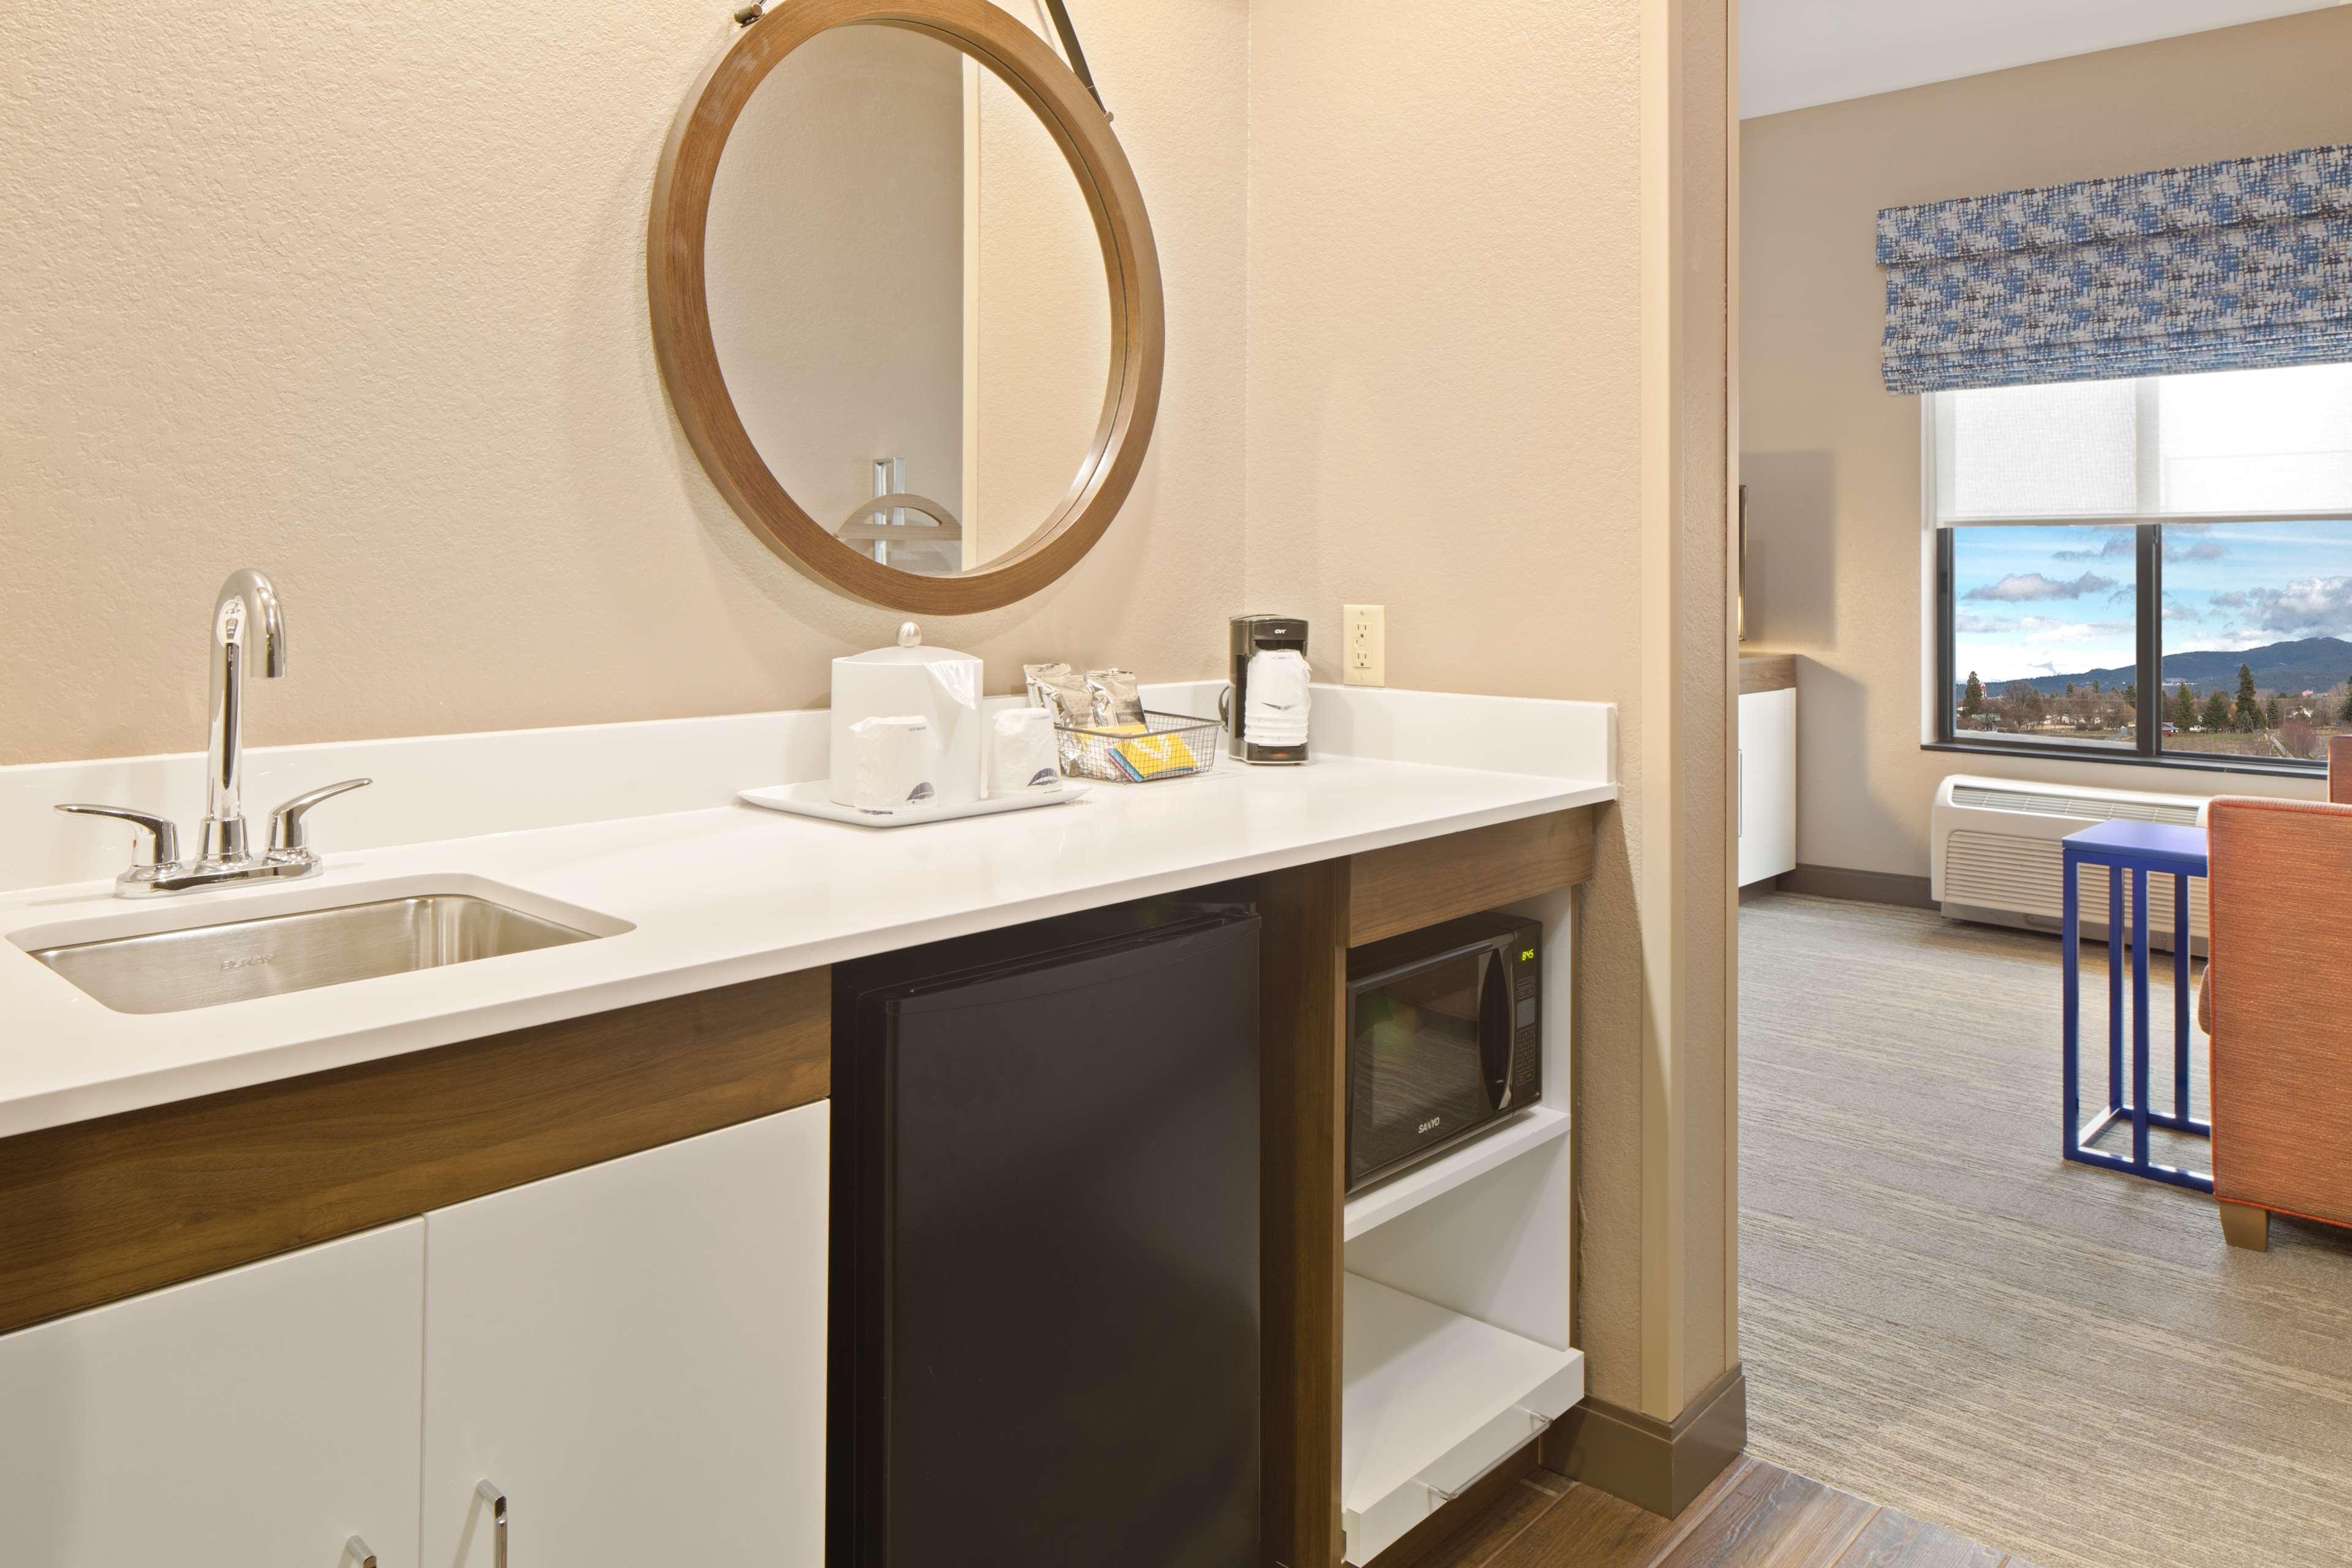 Hampton Inn & Suites Spokane Valley image 32